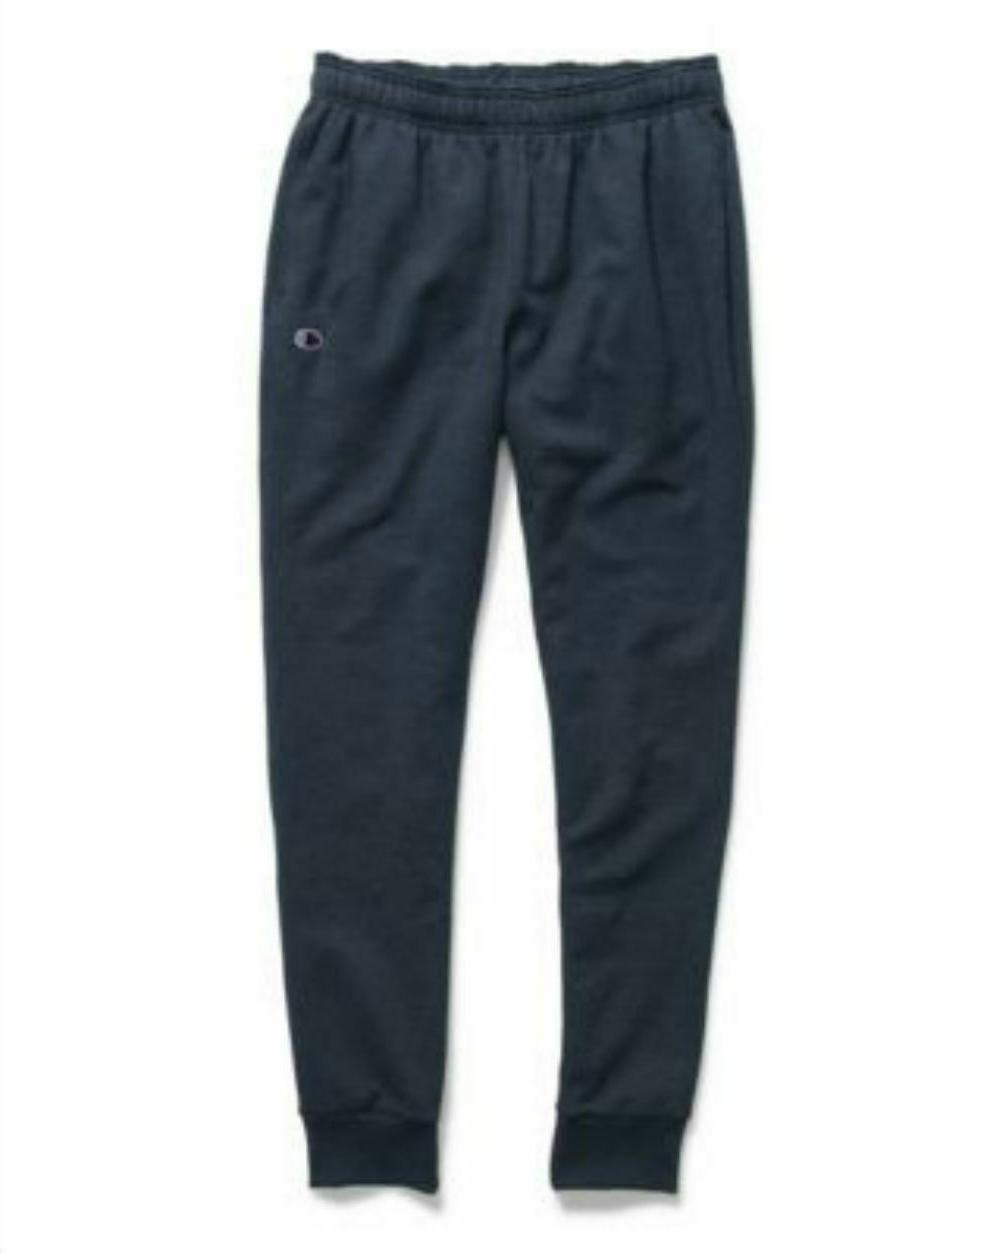 Champion Jogger Pants Trouser S-2XL